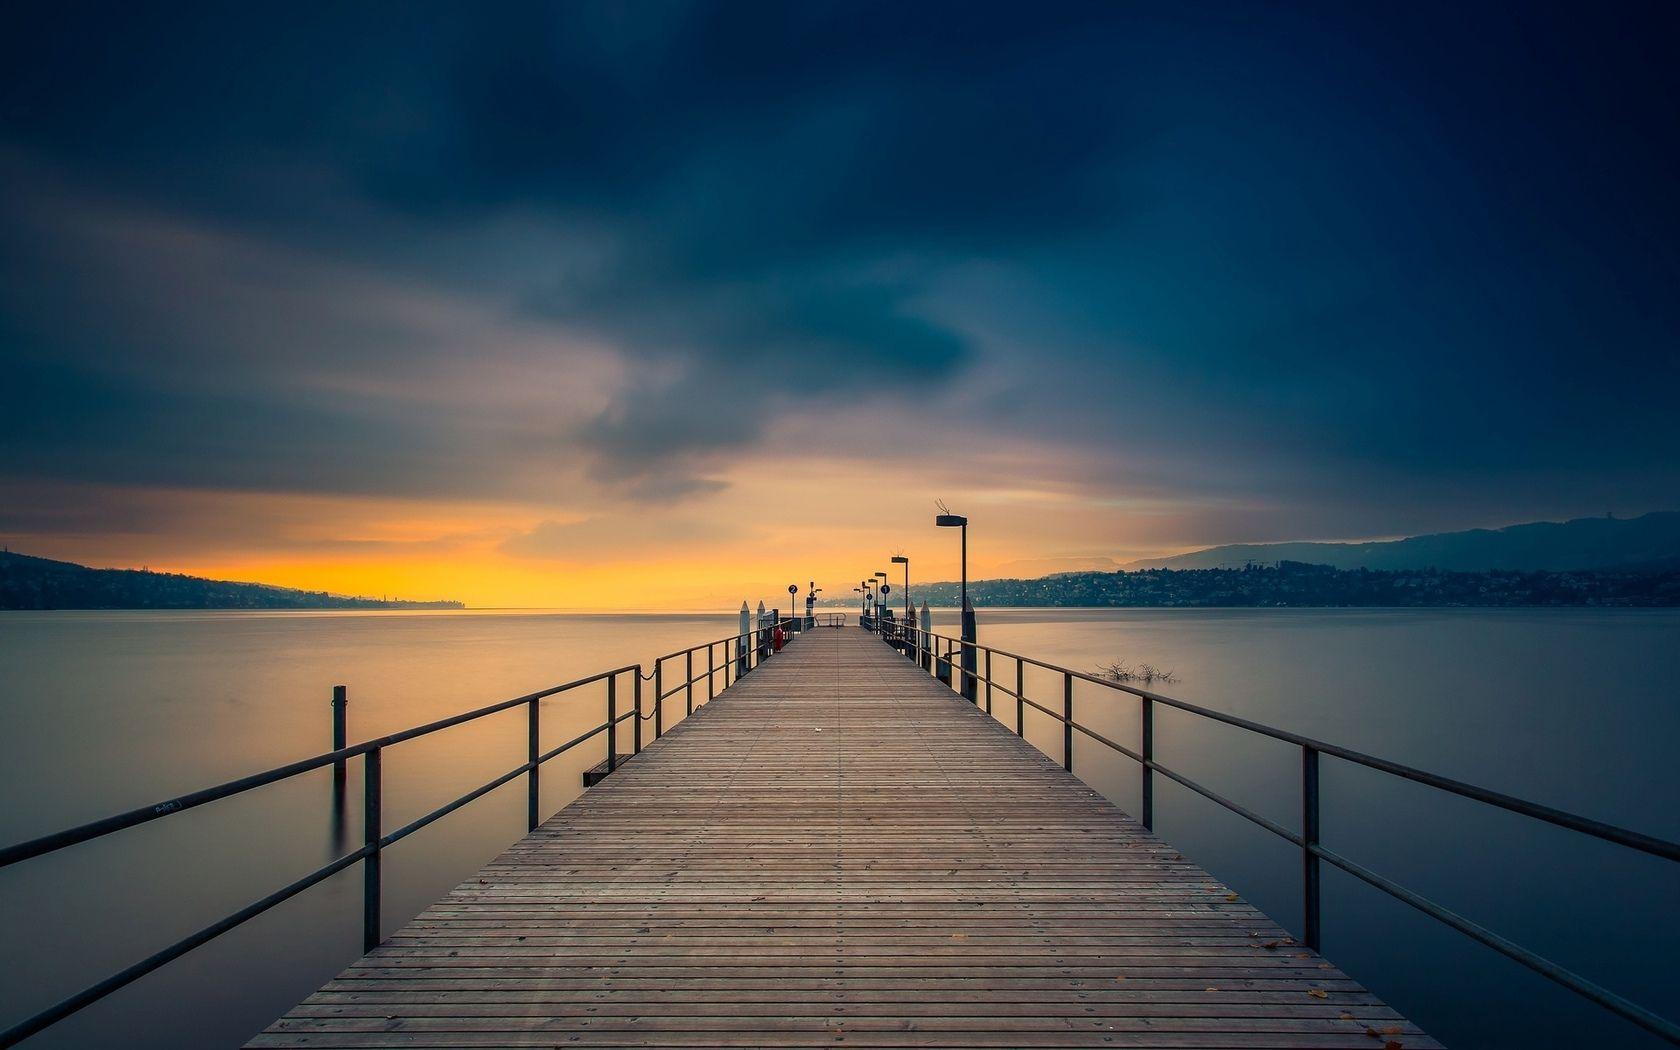 Pin By Anna Kuznetsova On Drawing Dusk Sunset Sky Sky Wallpaper sky clouds pier sea horizon